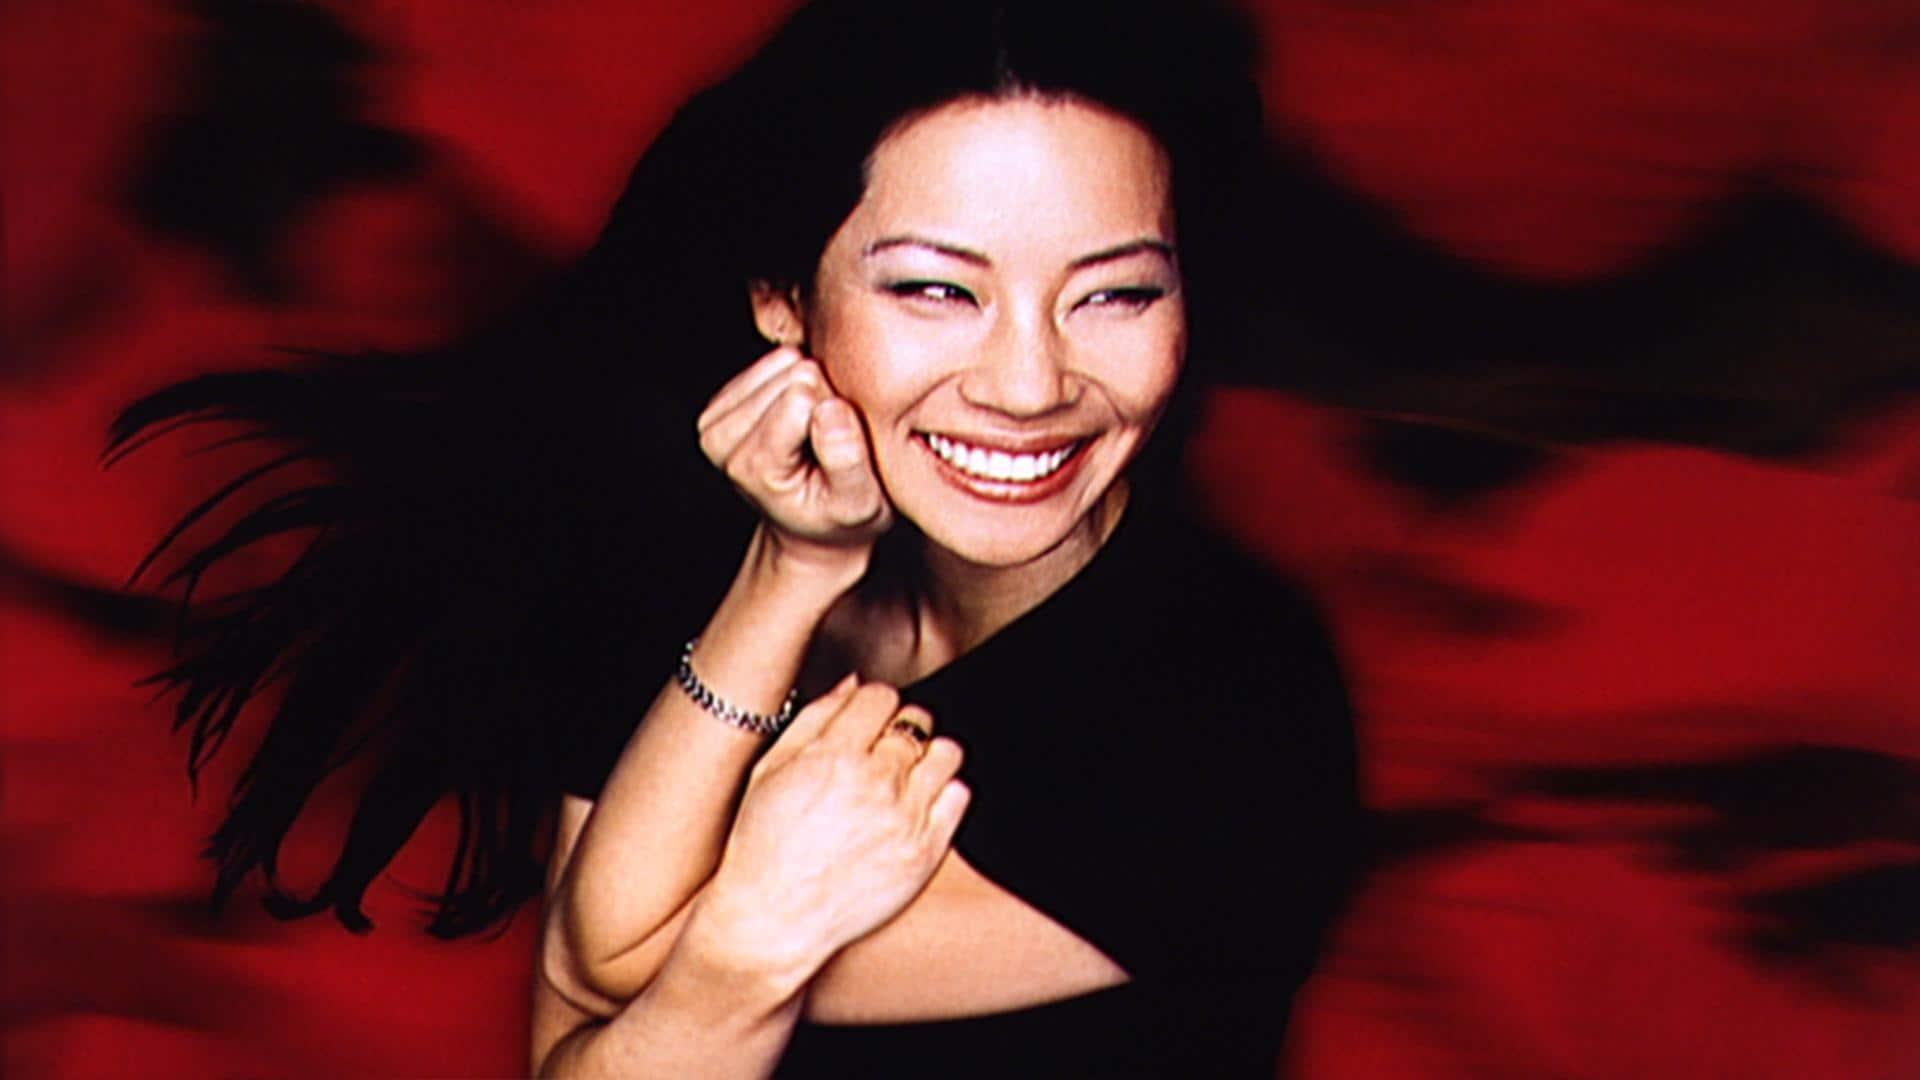 Lucy Liu: December 16, 2000